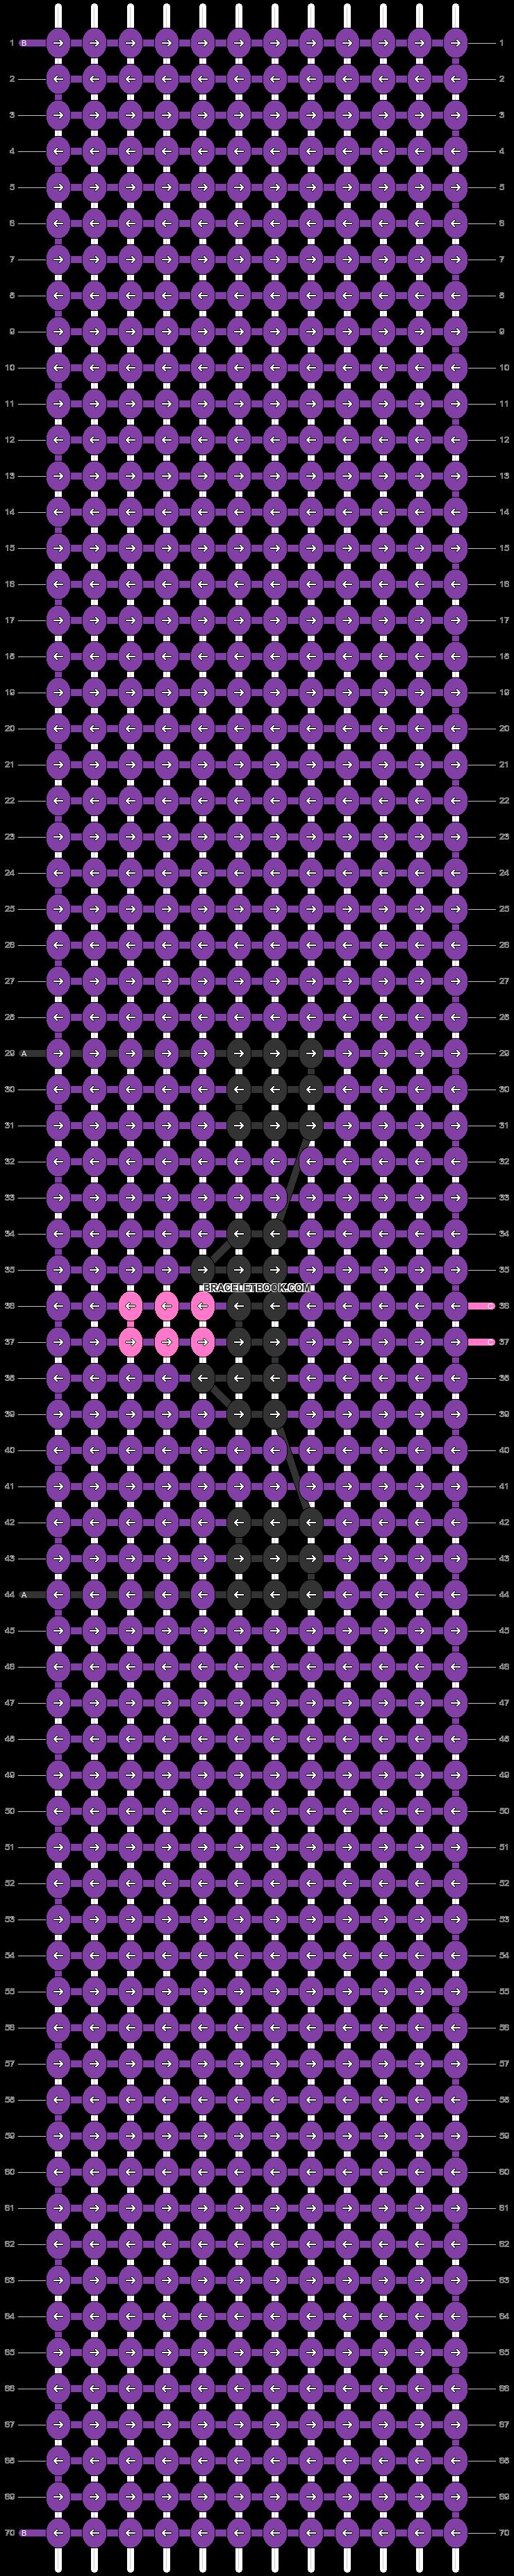 Alpha pattern #45880 variation #135768 pattern